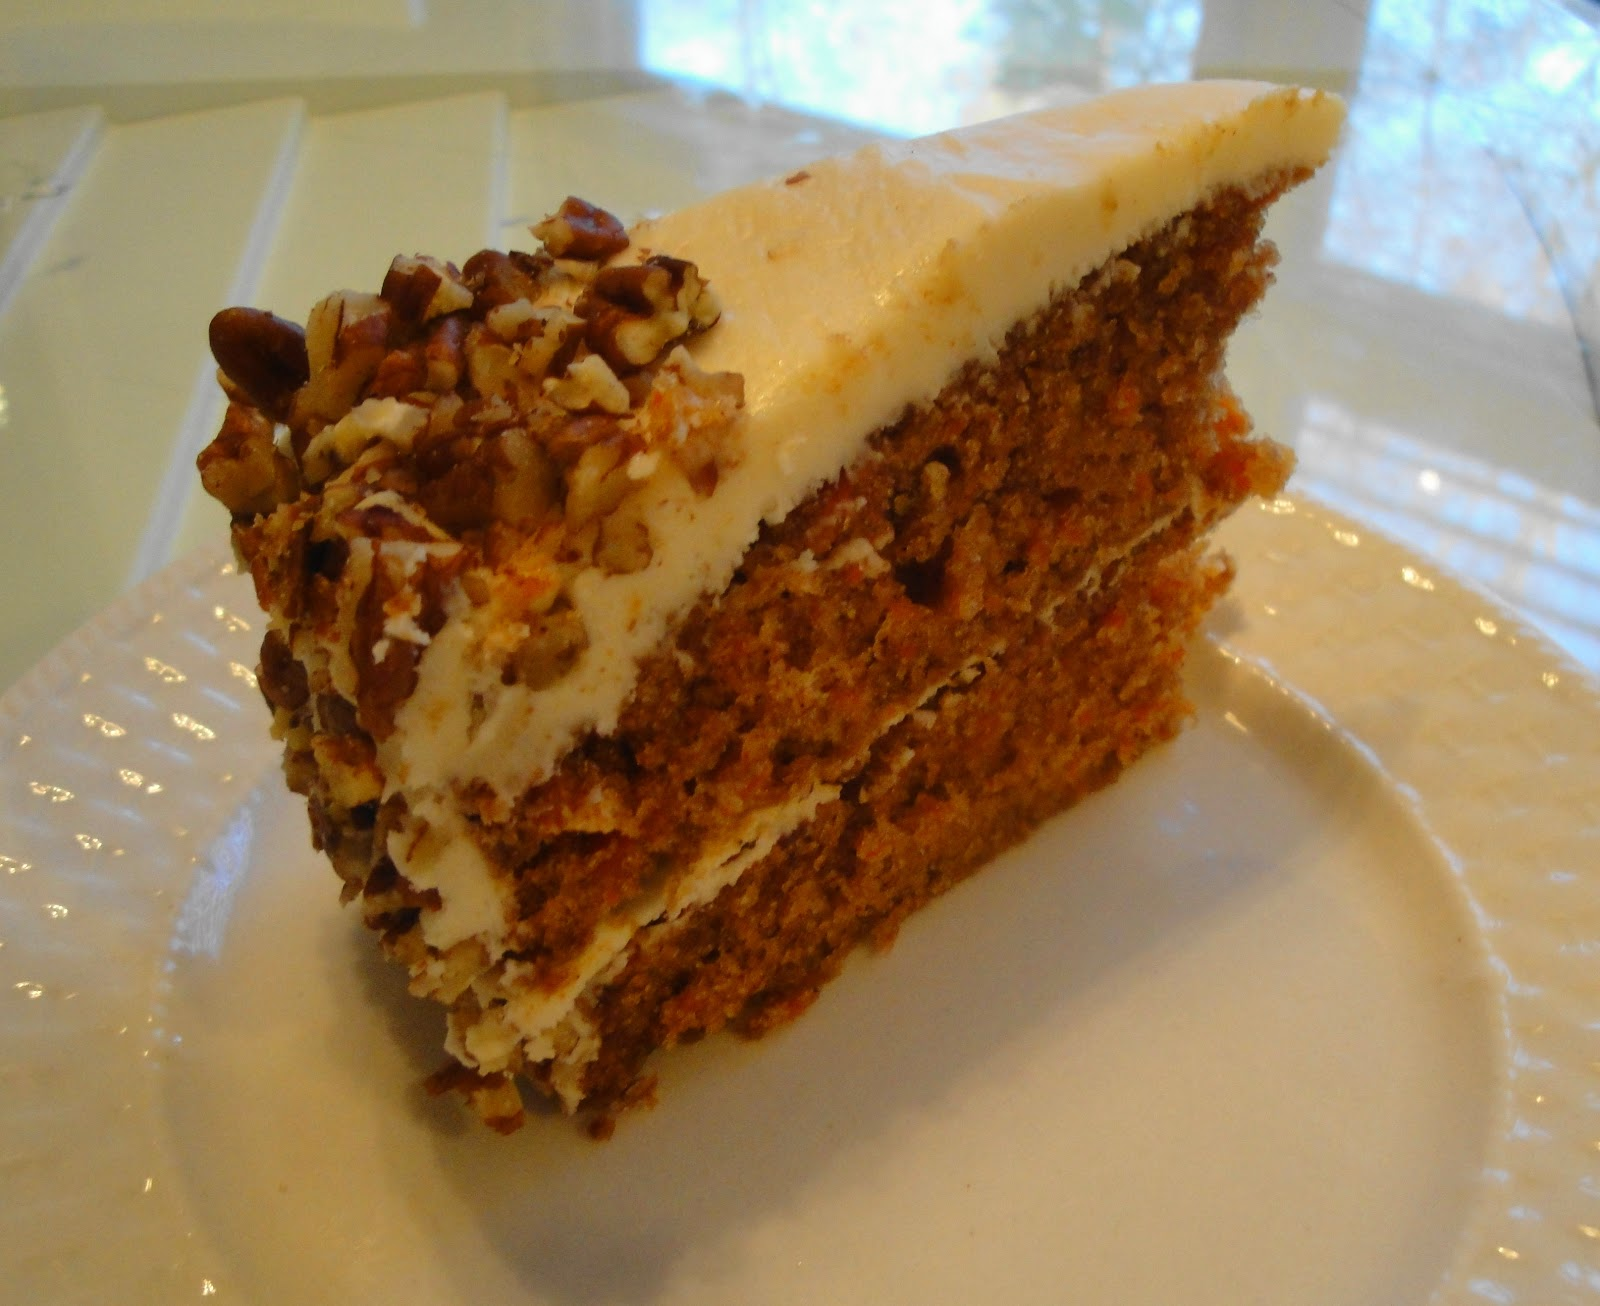 Homemade Icing Recipe For Carrot Cake